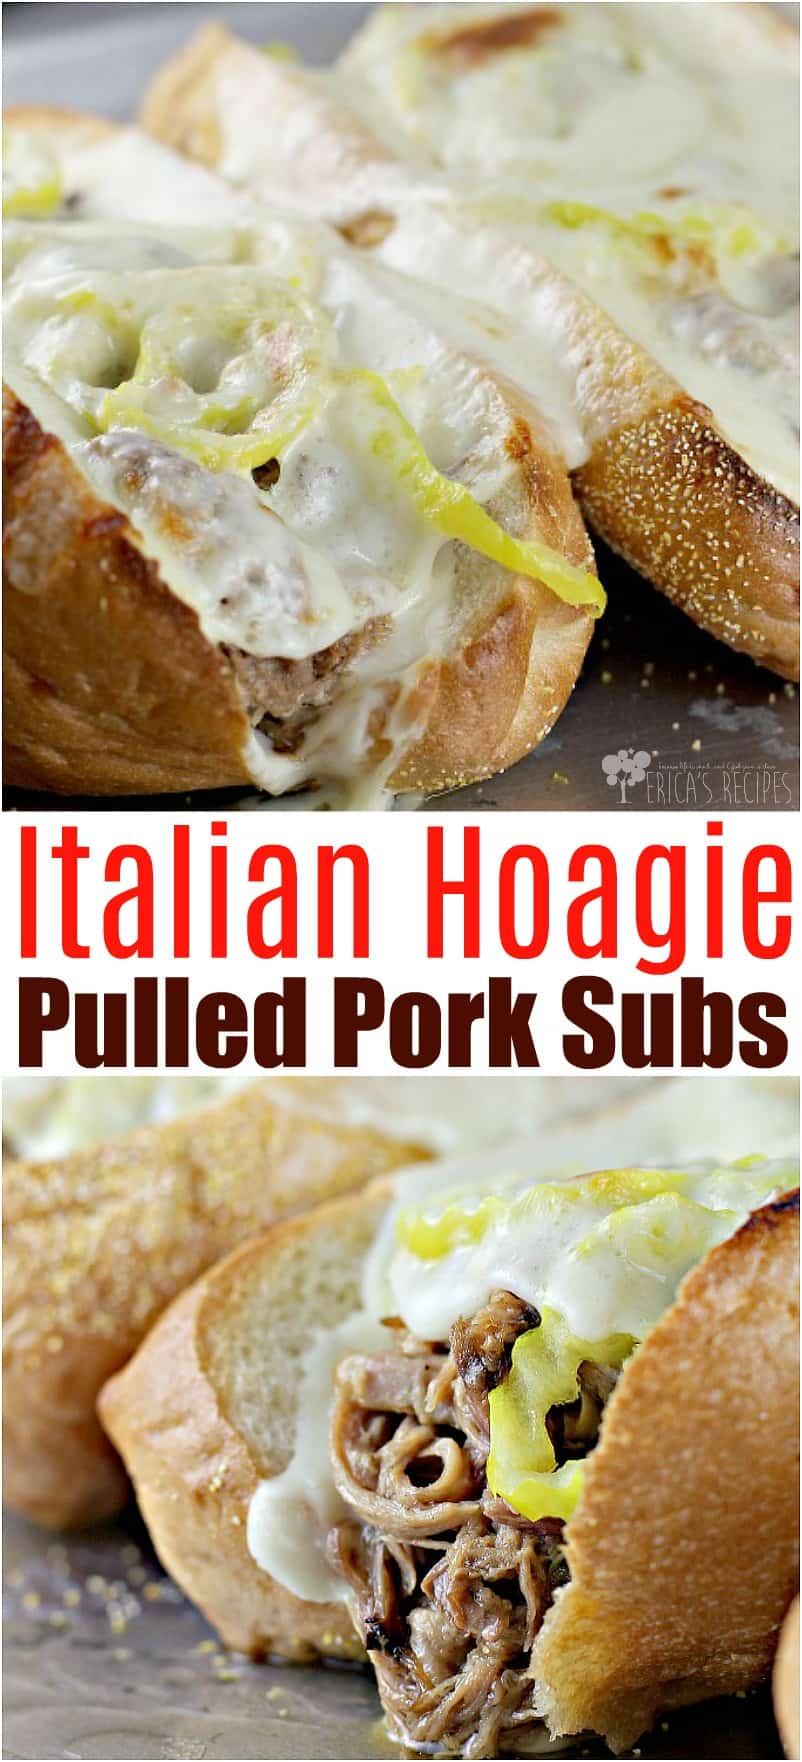 Italian Hoagie Pulled Pork Subs #recipe #pork #food #slowcooker #crockpot